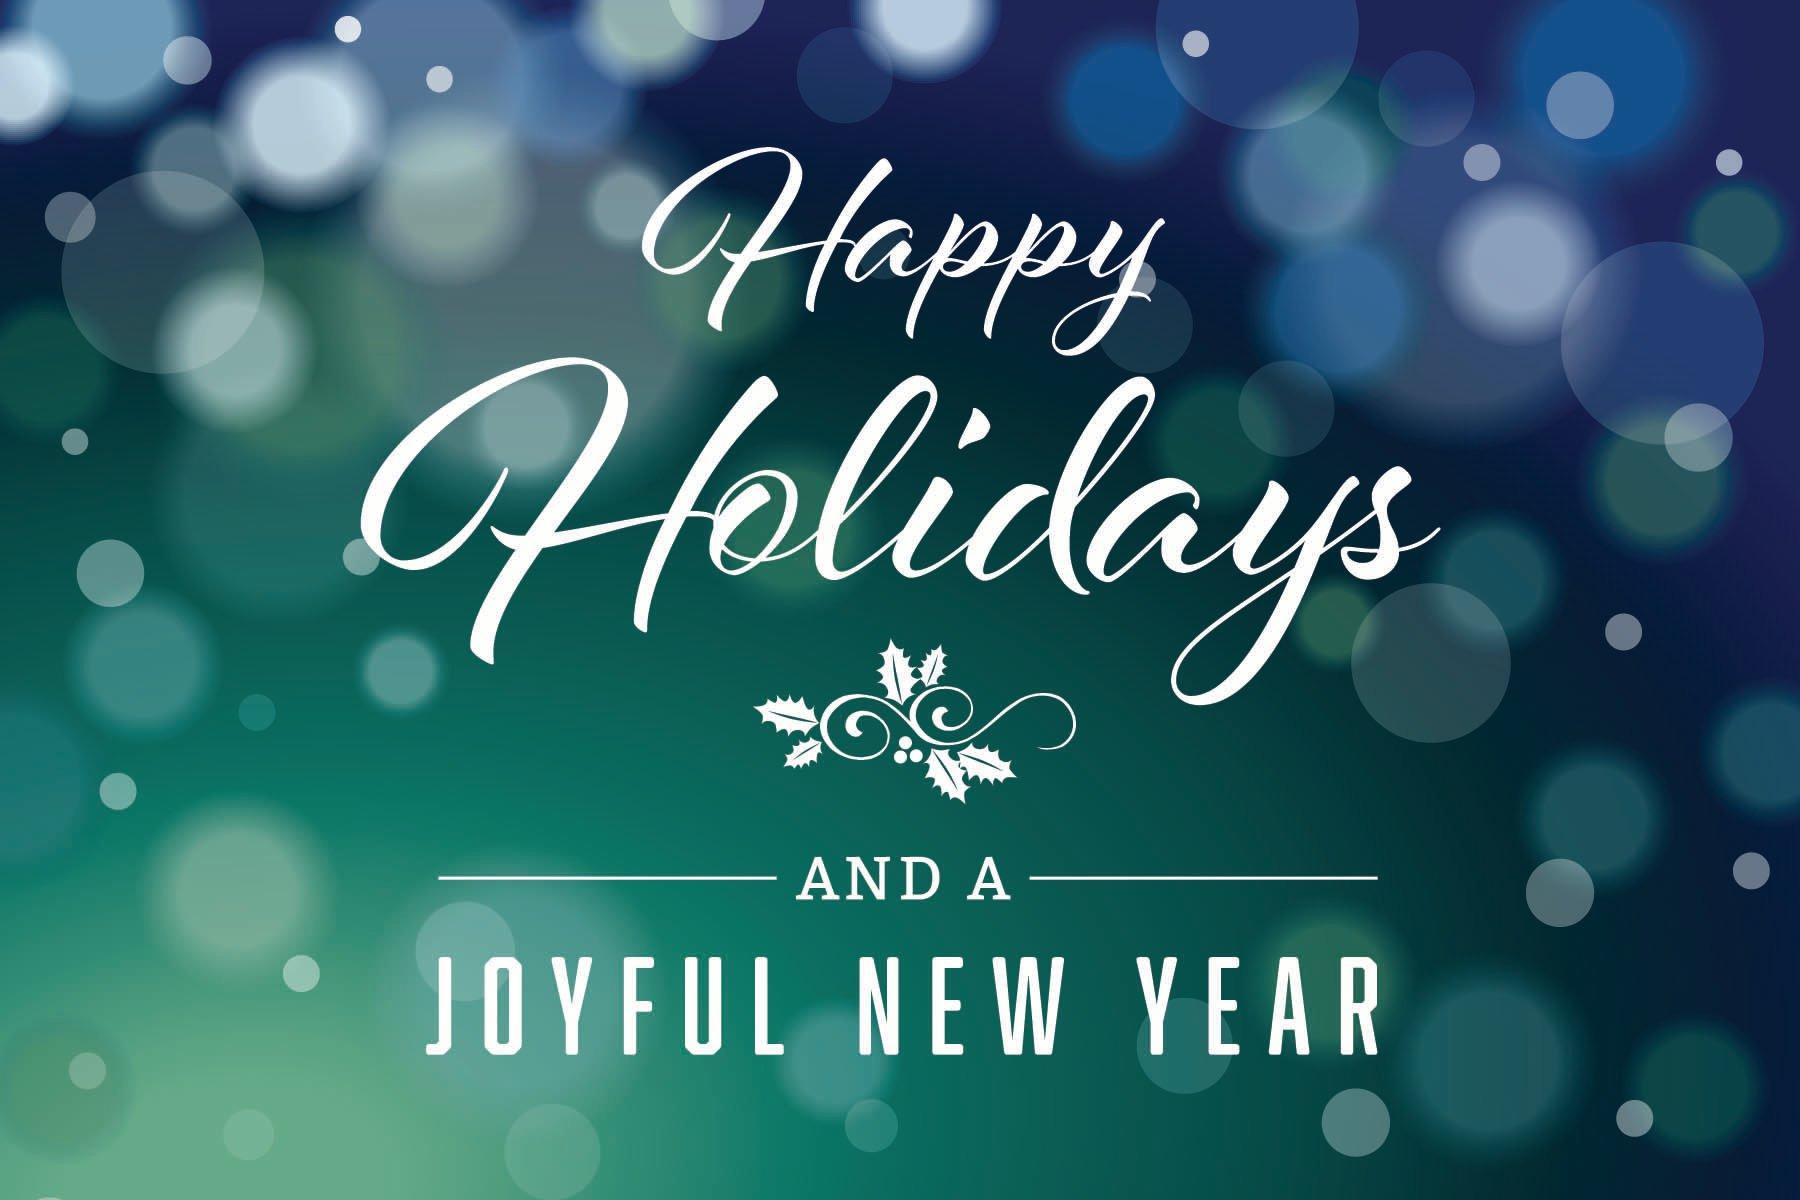 Buckeye Wealth Happy Holidays